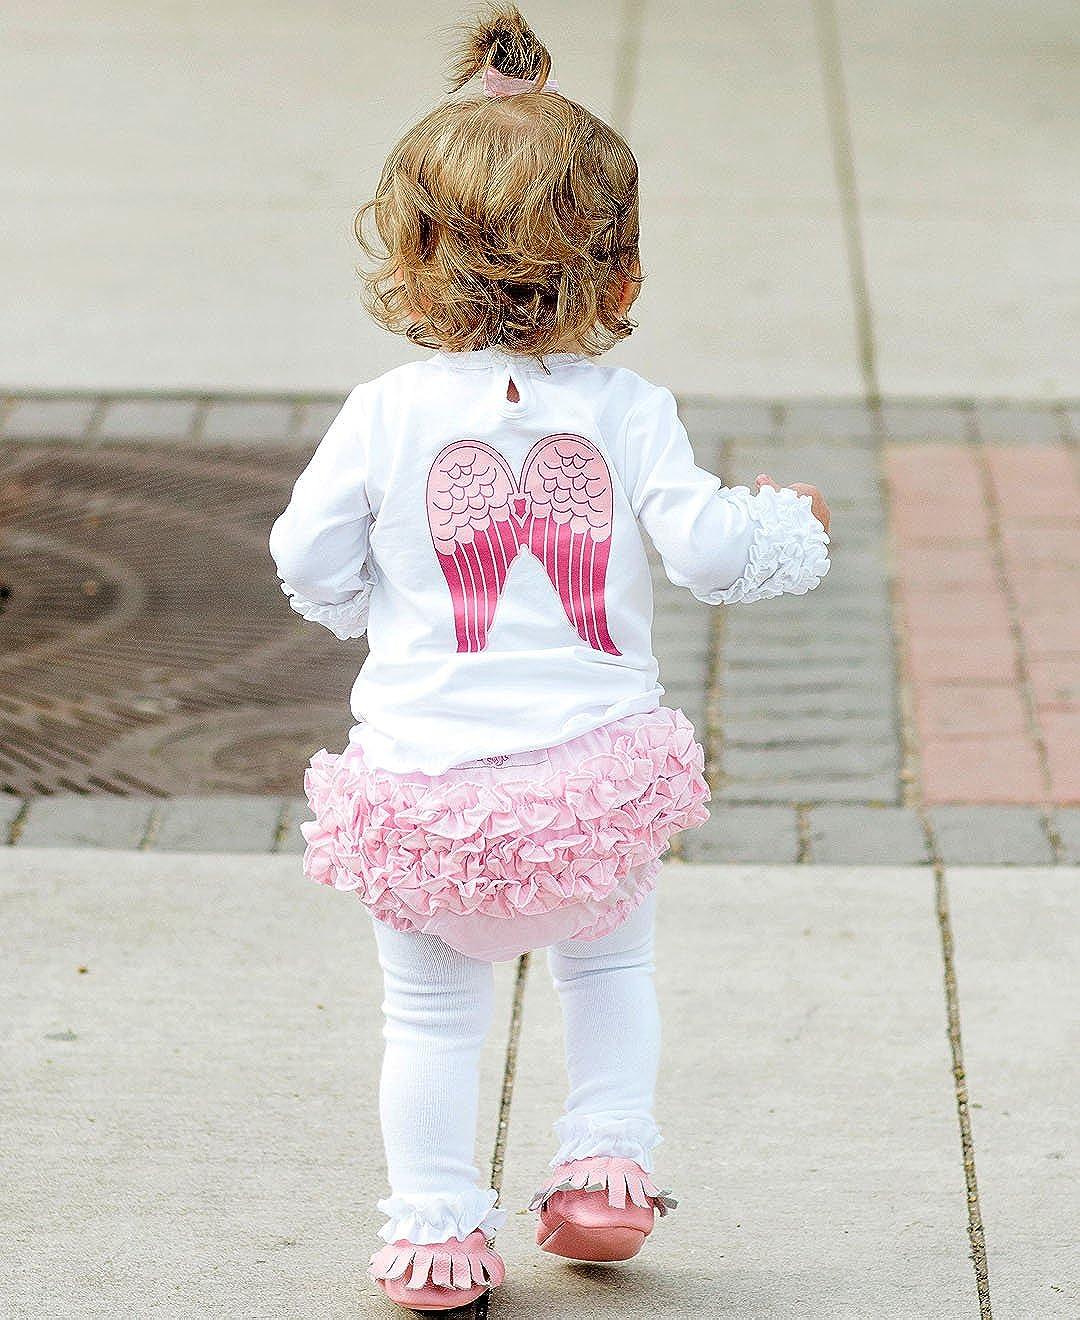 6-12m RuffleButts Baby//Toddler Girls Toddler Pink Cotton Ruffled Diaper Cover